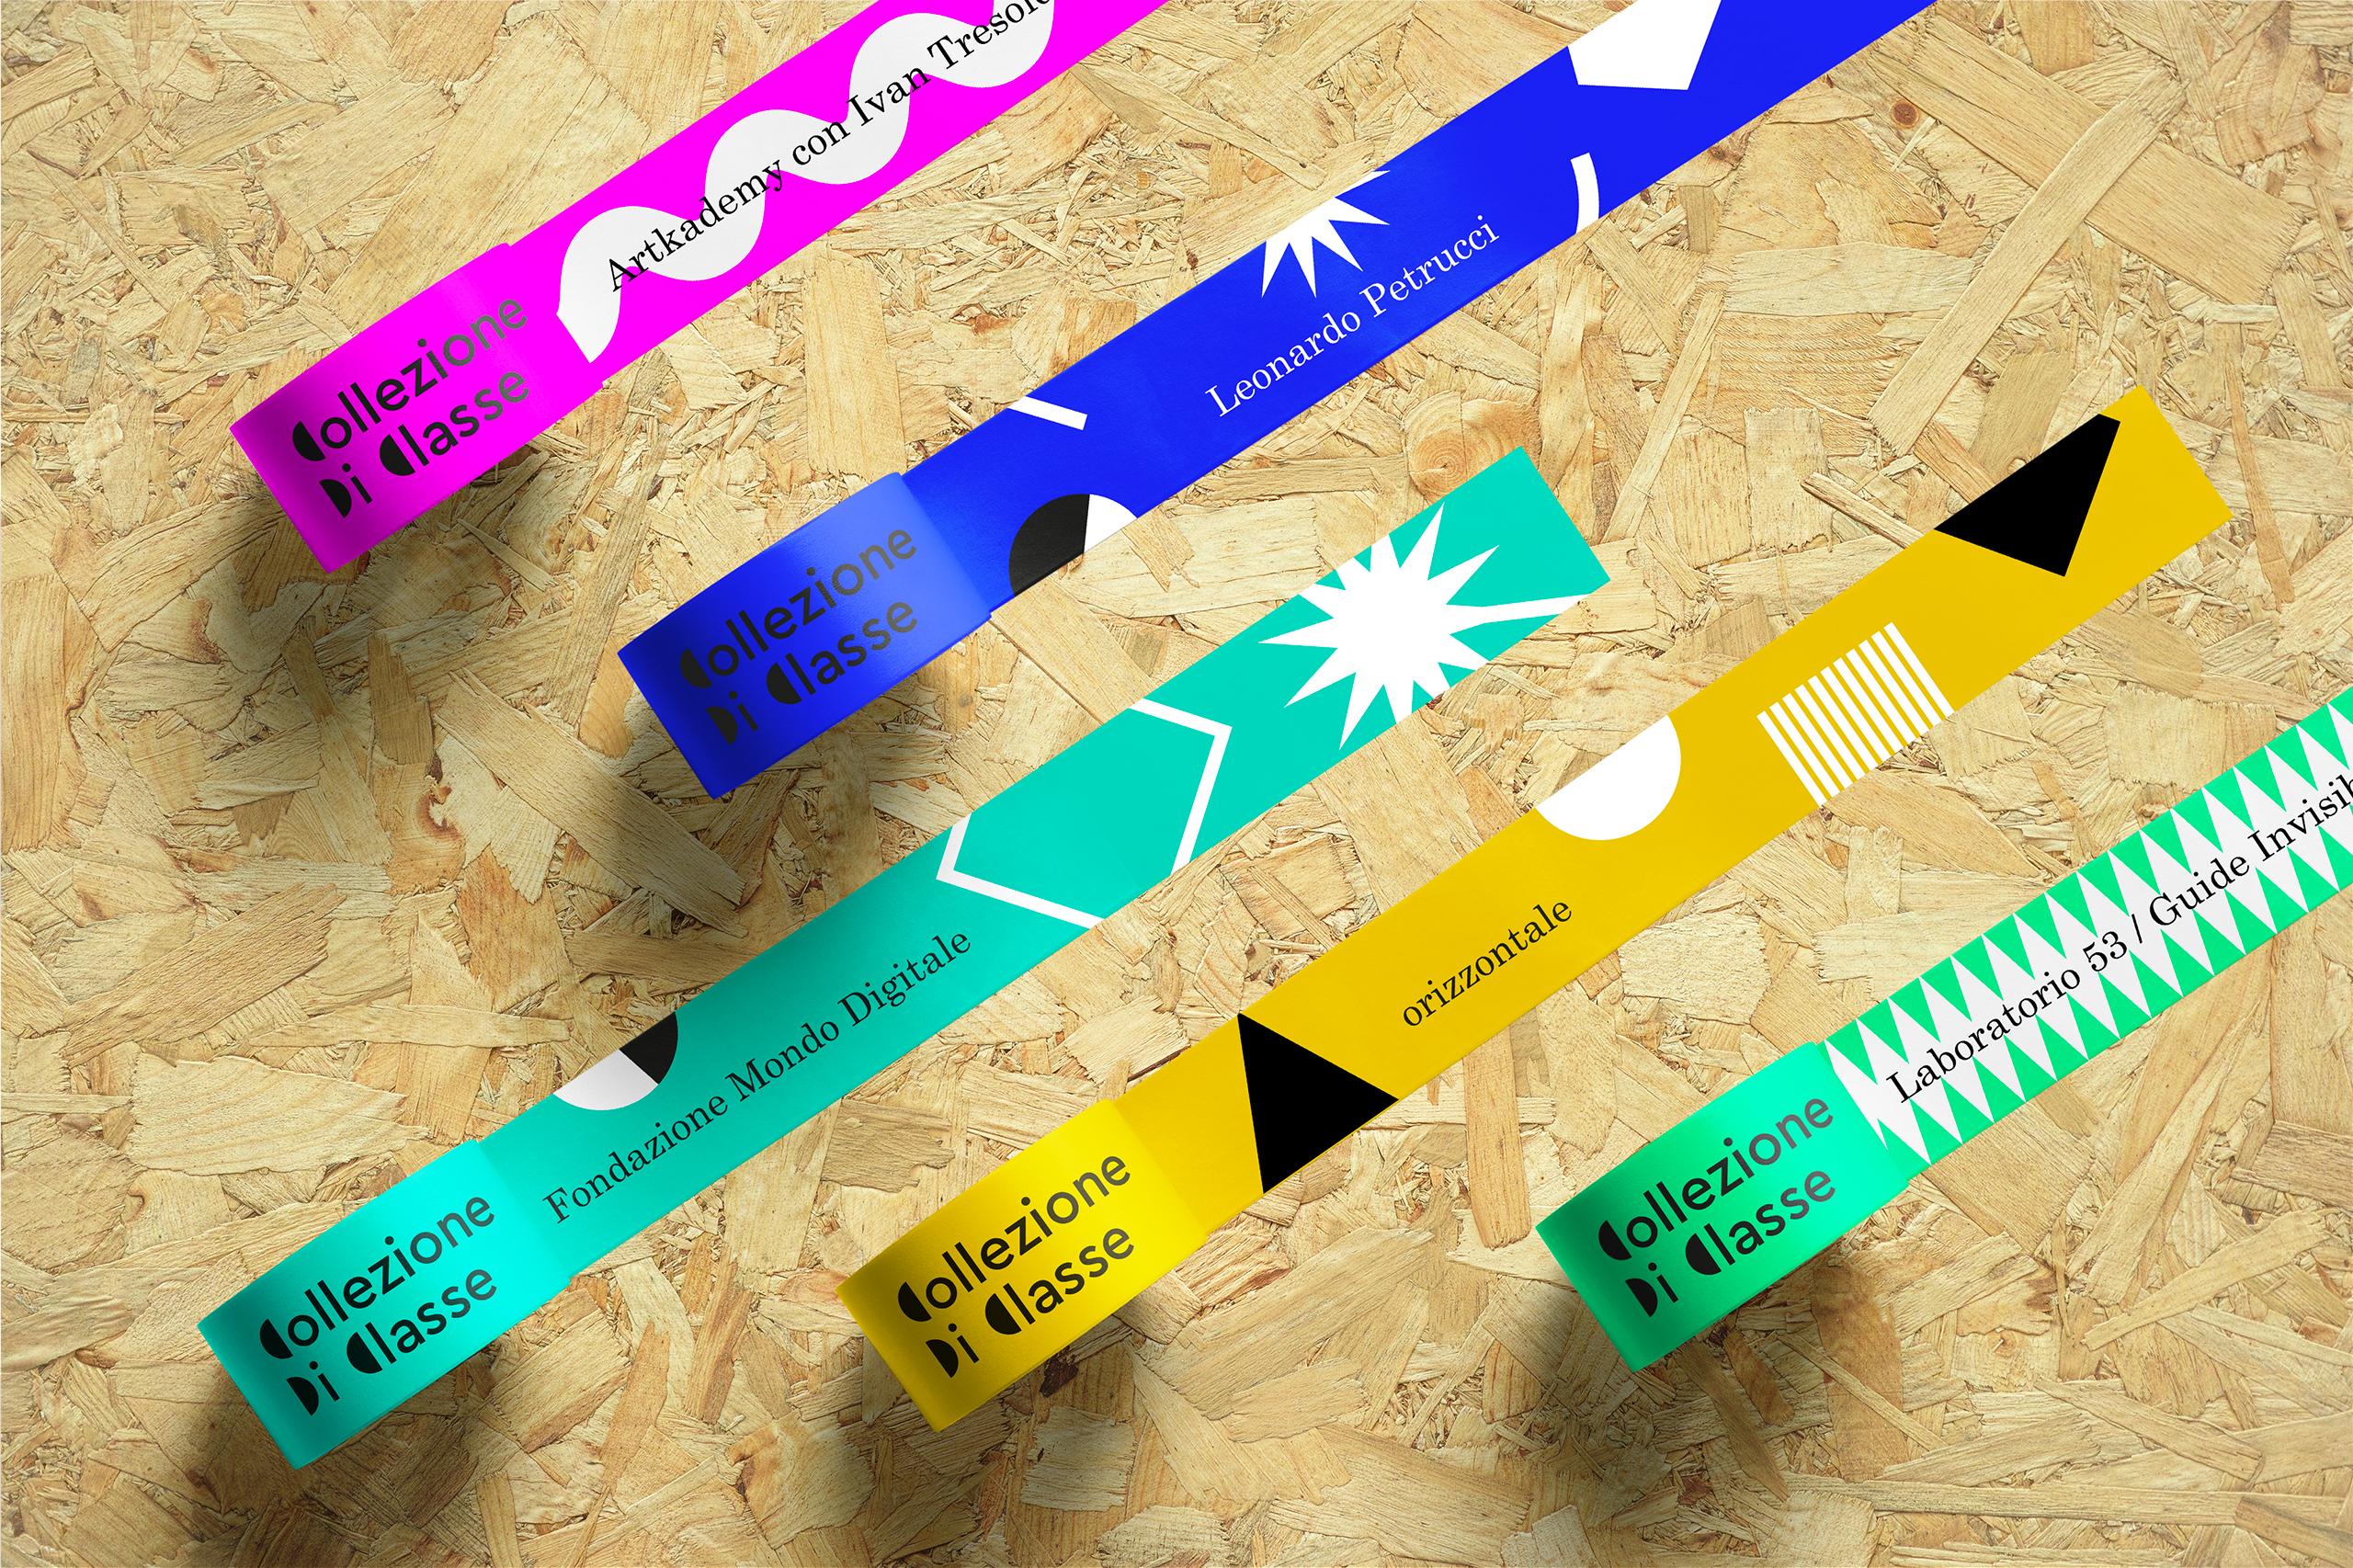 Giampiero_Quaini_collezionediclasse_tapes_2